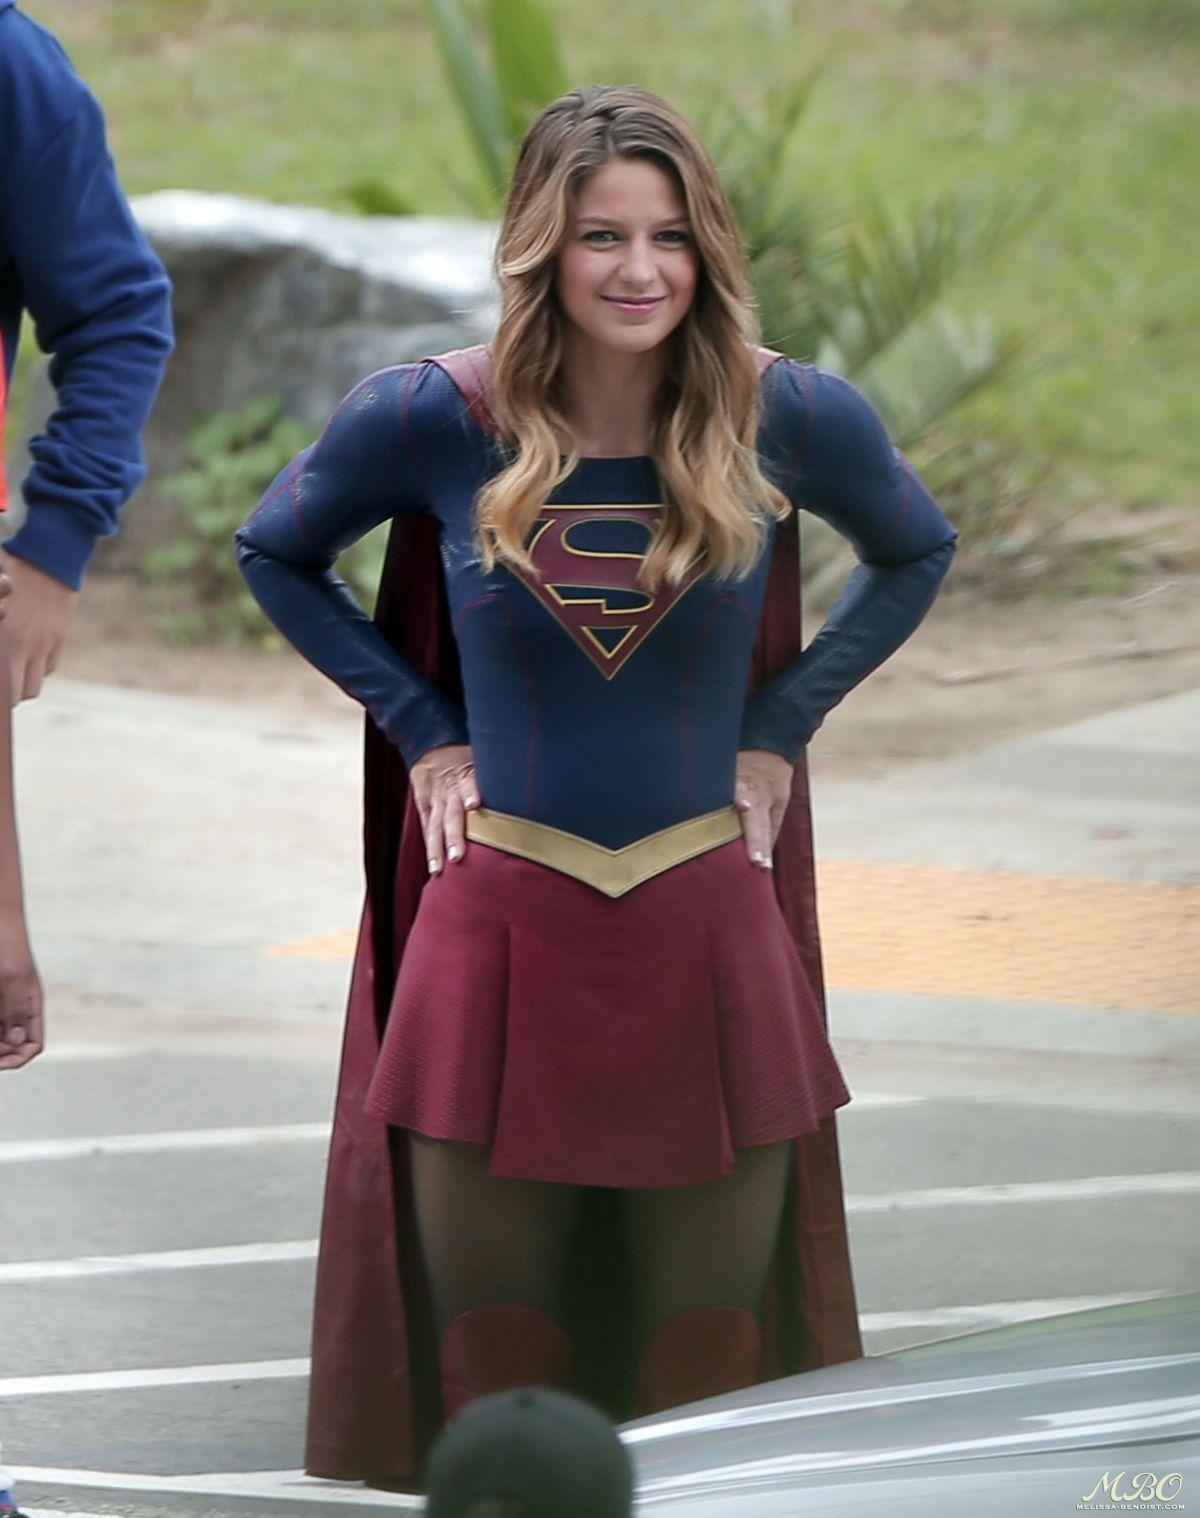 img@@@.imagetwist.com0 melissa-benoist-on-the-set-of-supergirl-in-